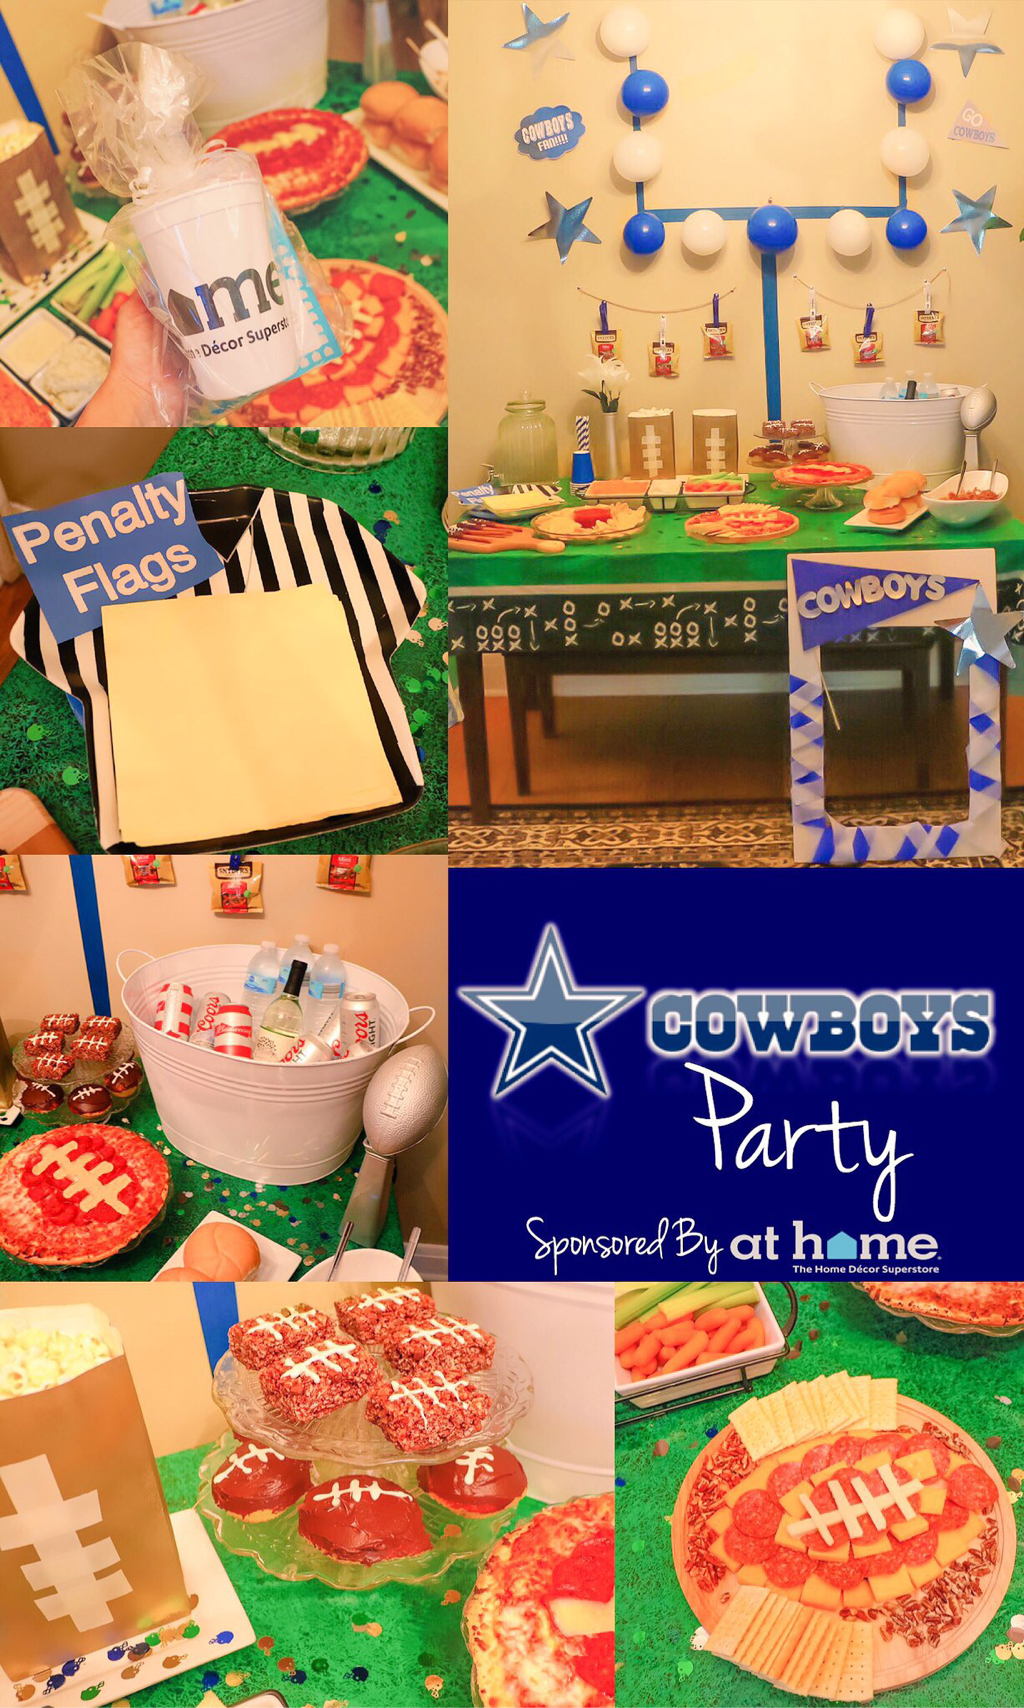 DALLAS COWBOYS FOOTBALL PARTY ATHOME STORE Cowboy Birthday Party Dallas Cowboys Football